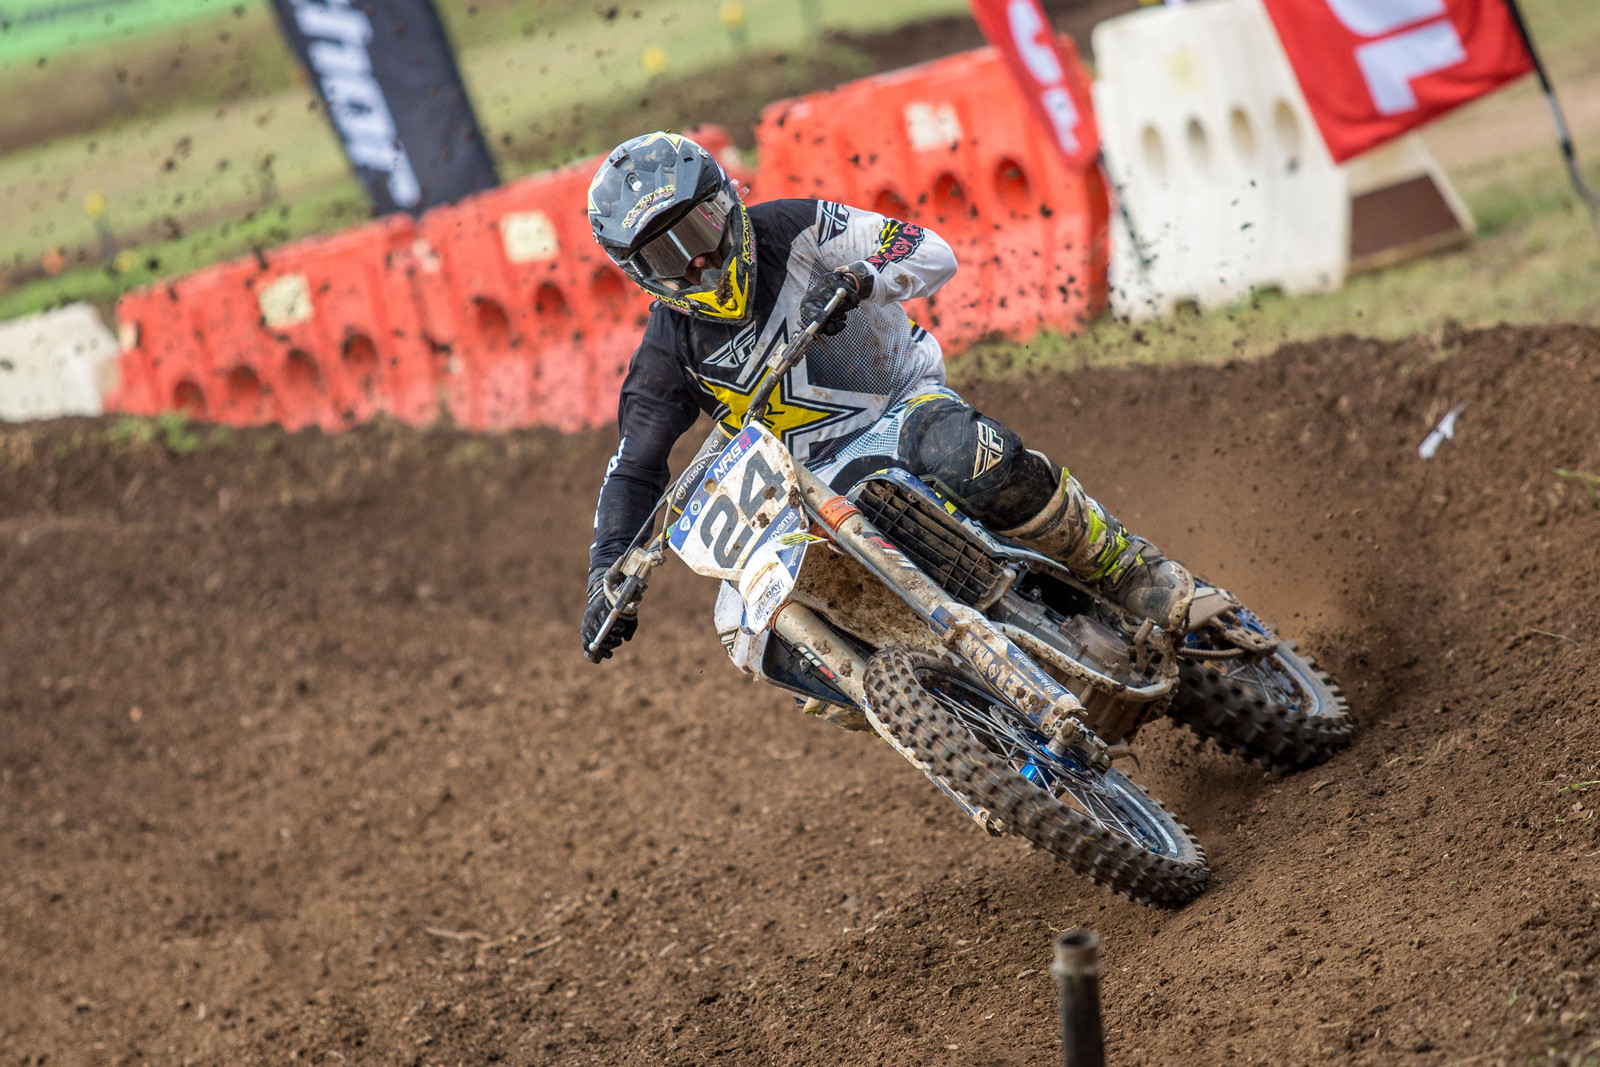 Brett Metcalfe - Australian Motul Motocross Nationals Round 2, Appin - Motocross Pictures - Vital MX